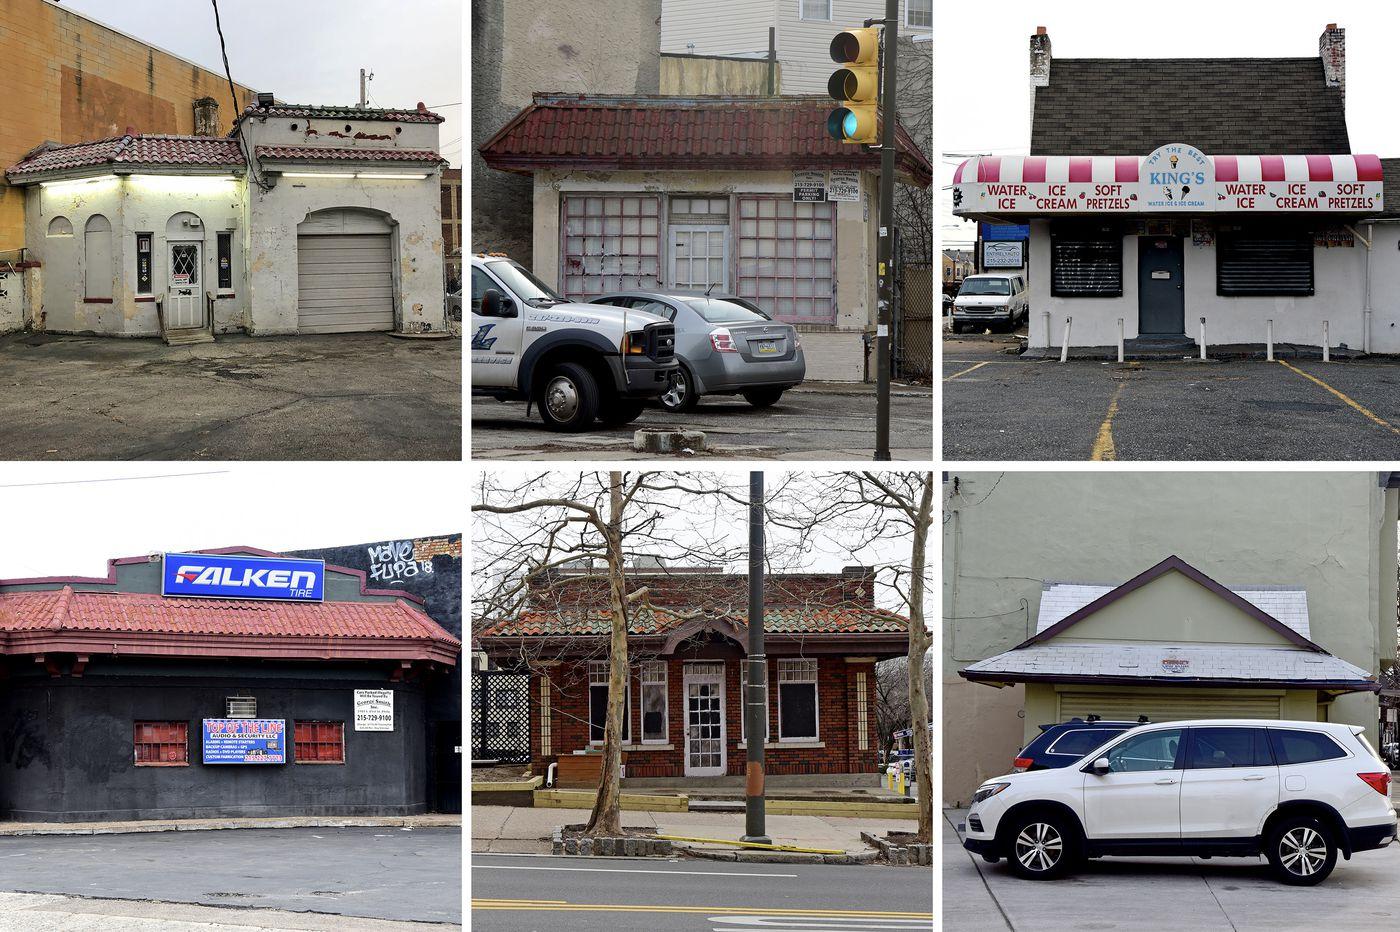 The forgotten history of Philadelphia's early gas stations | Inga Saffron